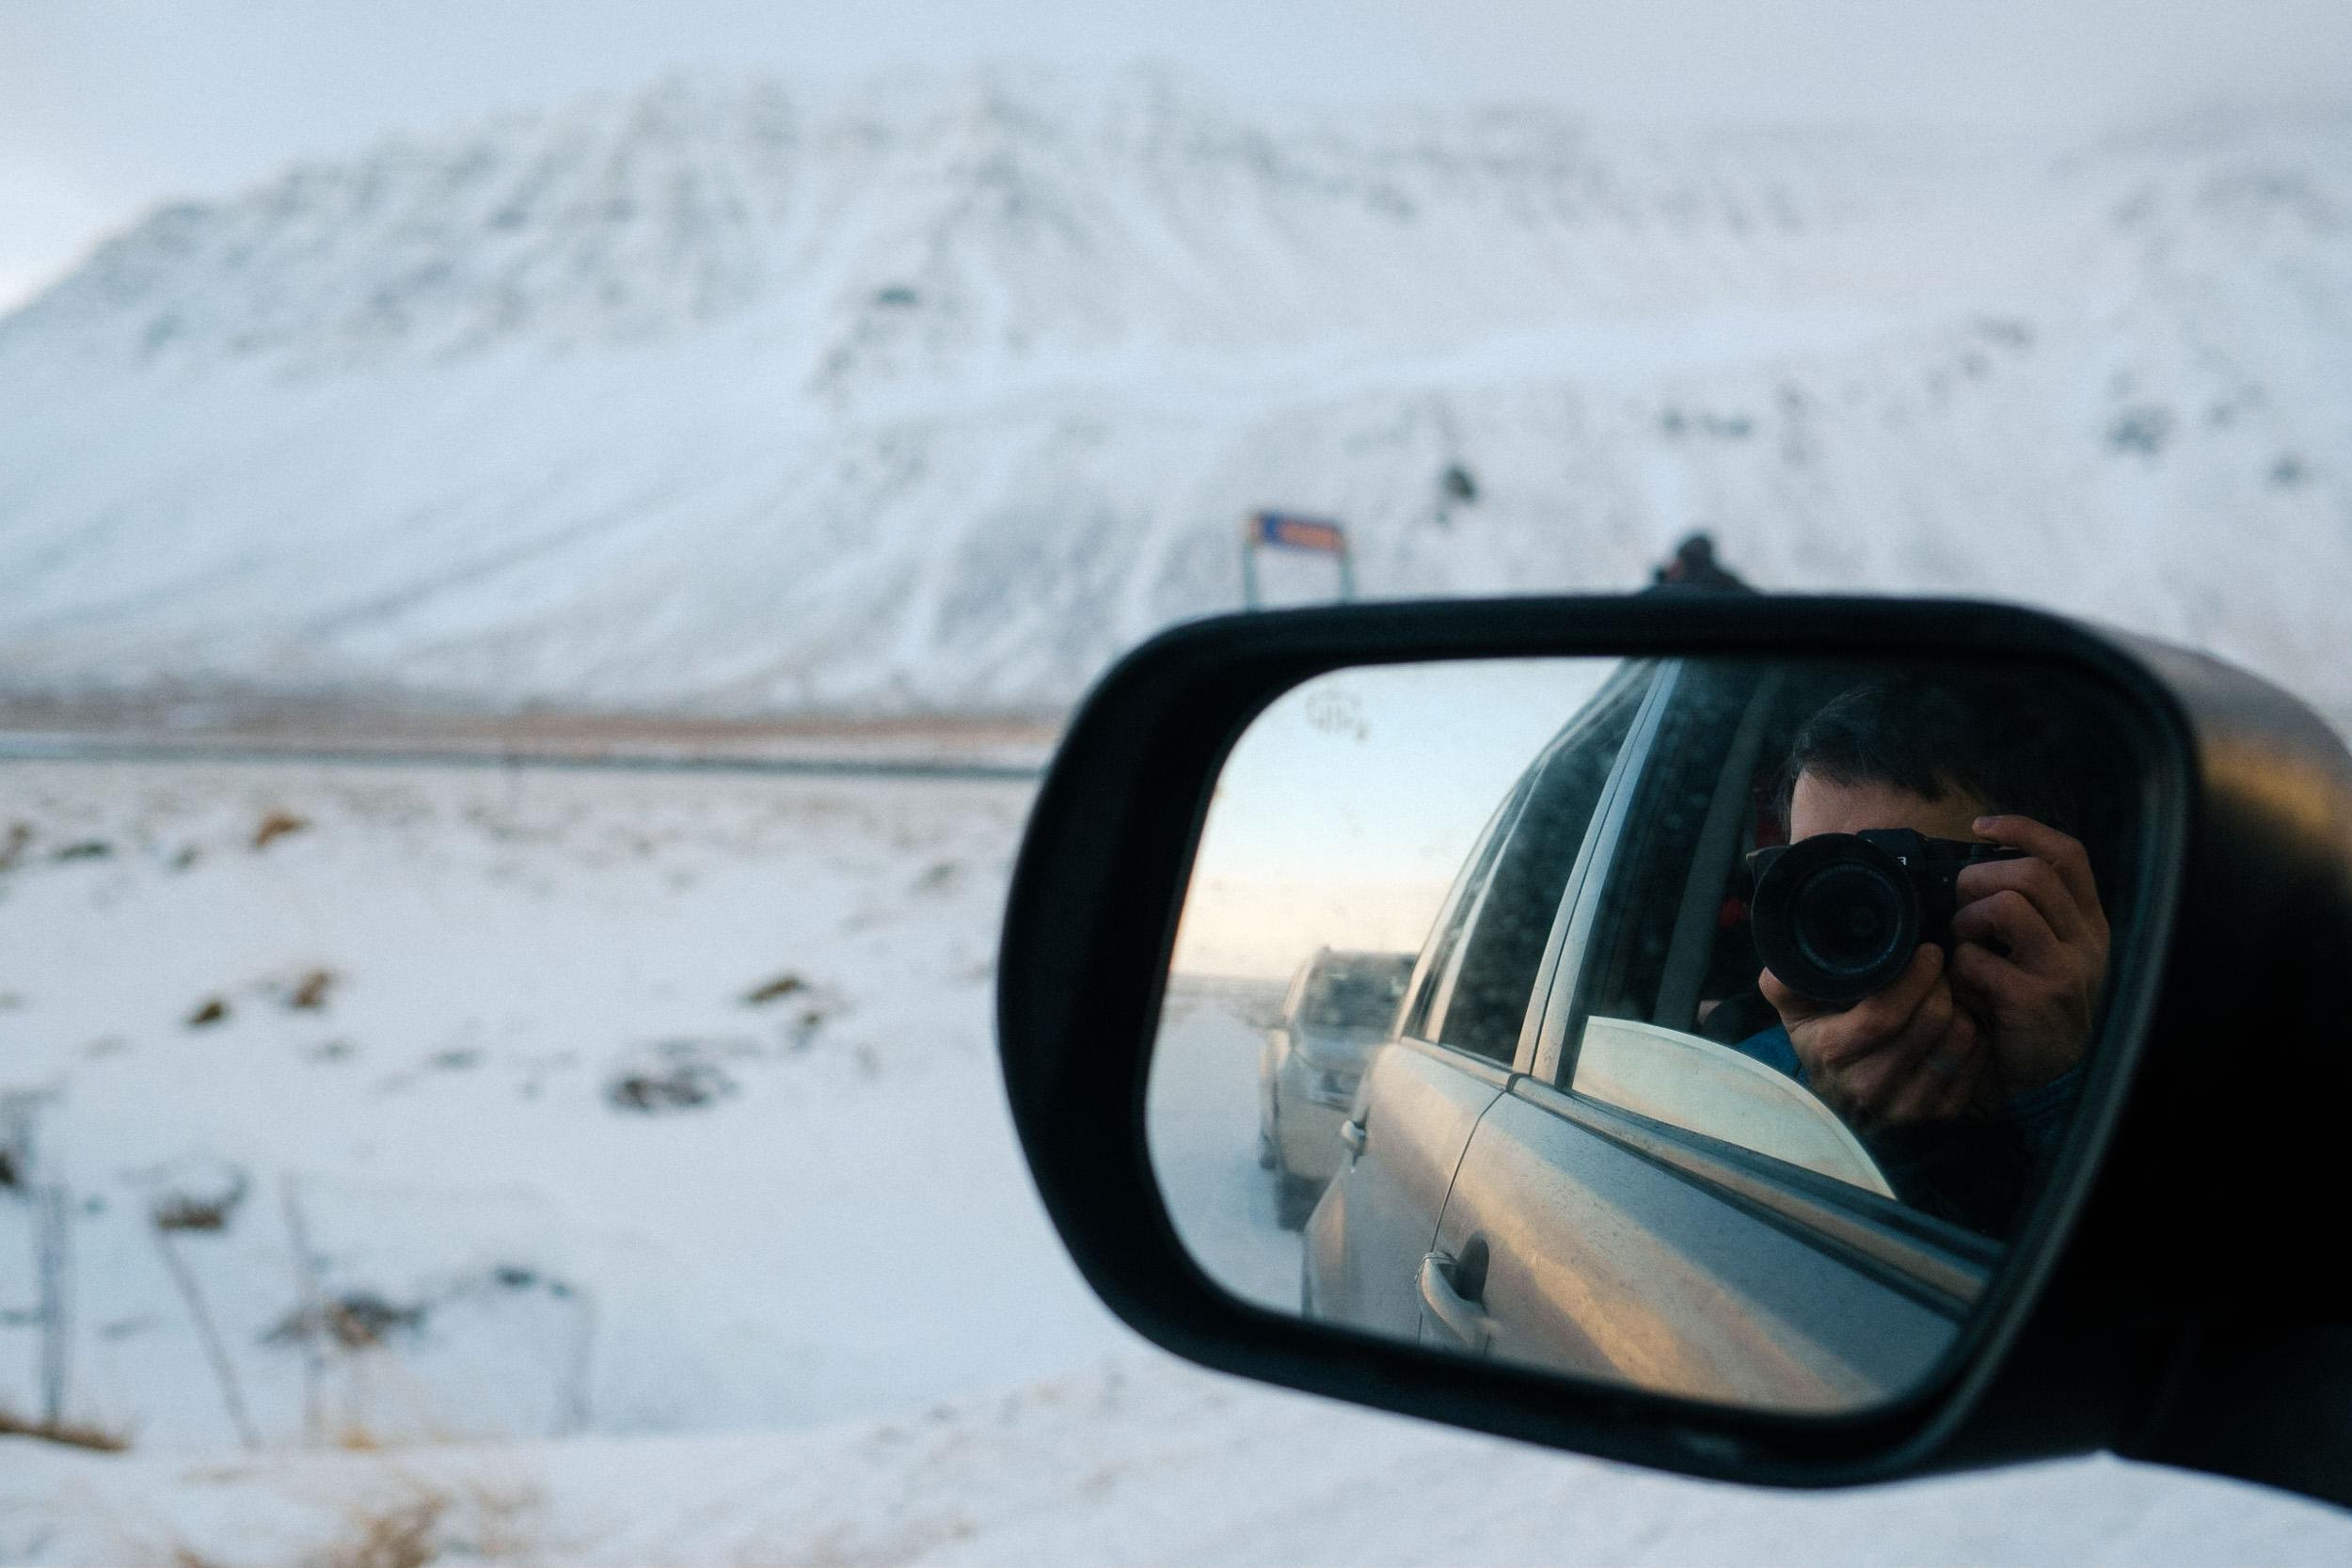 Collective_Wander_Iceland_Photographers_Trip_016.jpg